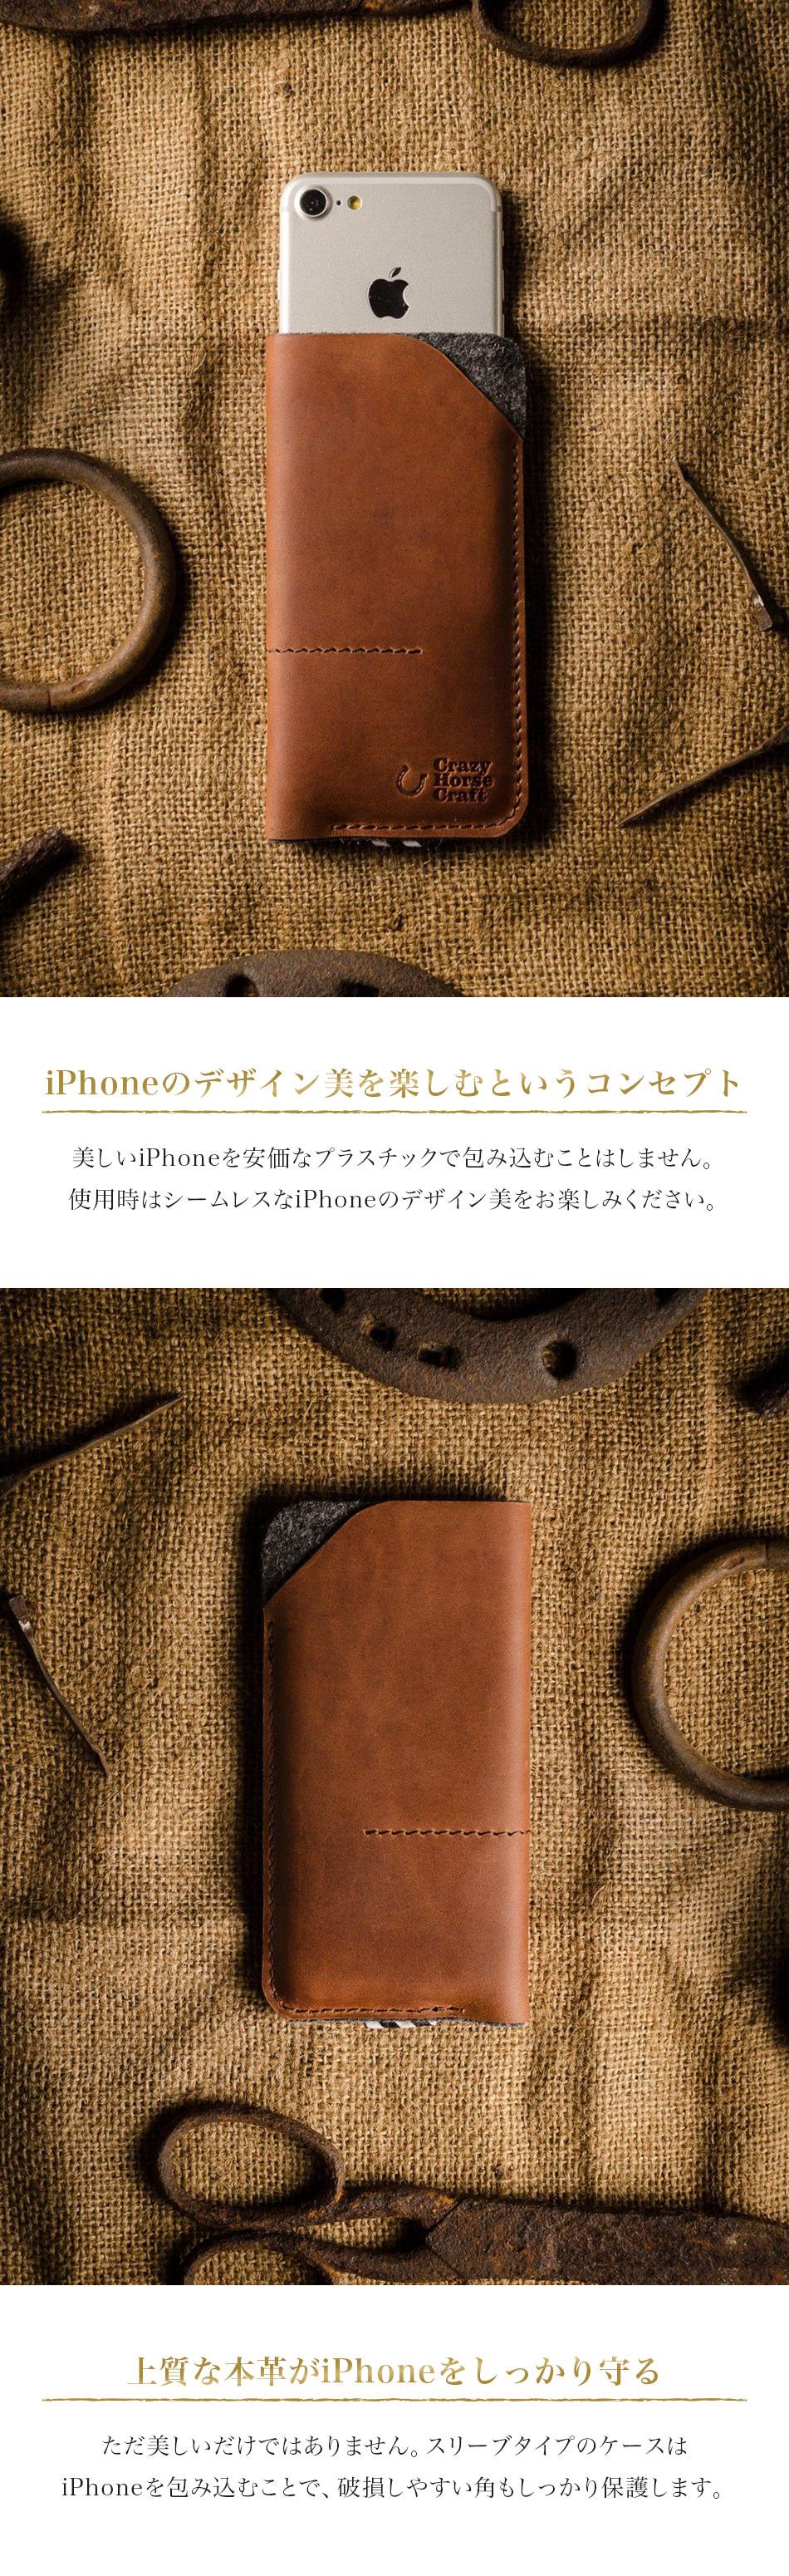 iPhoneのデザイン美を楽しむというコンセプト